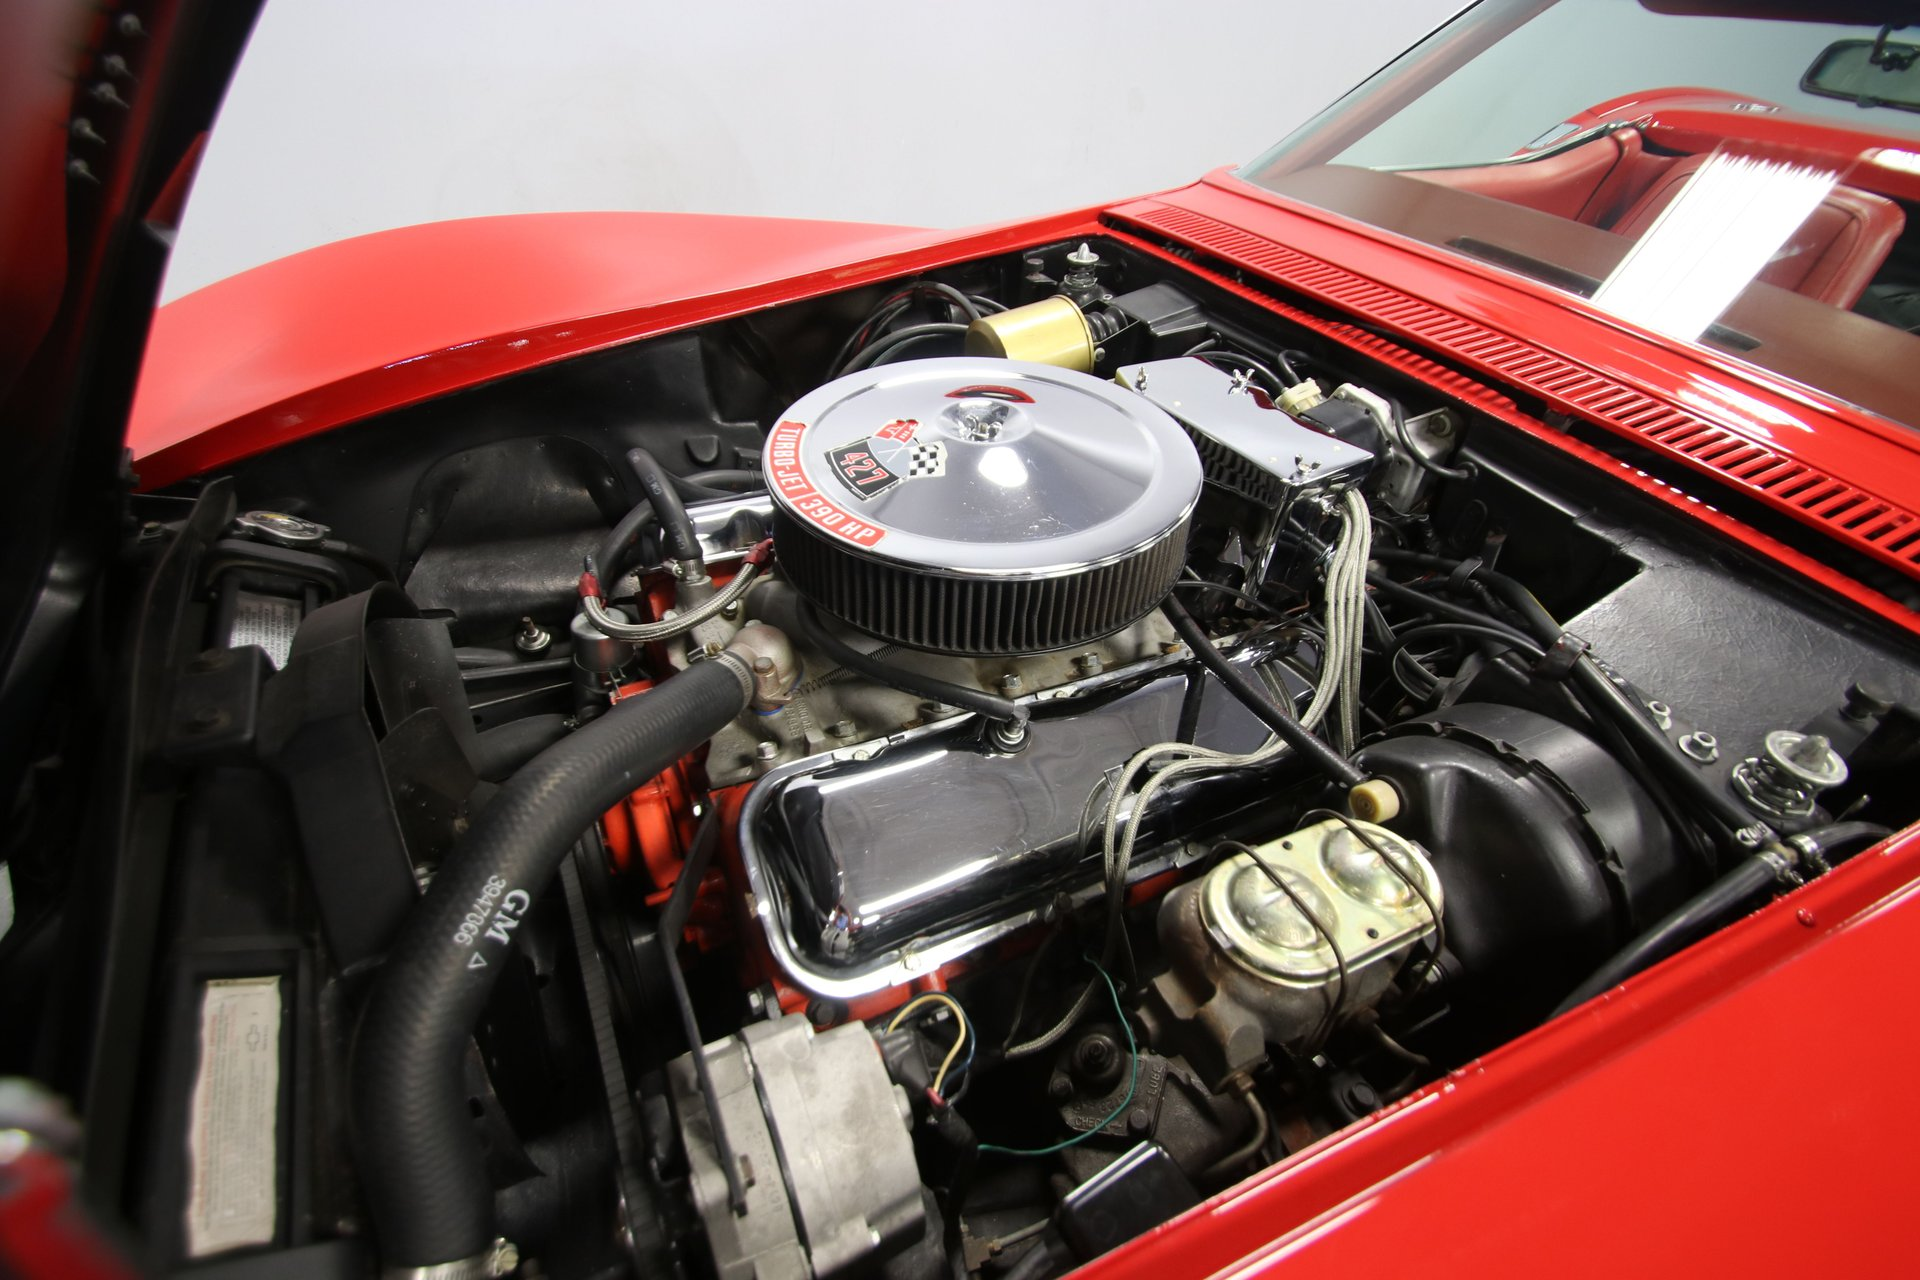 1968 chevrolet corvette l36 427 390hp convertible